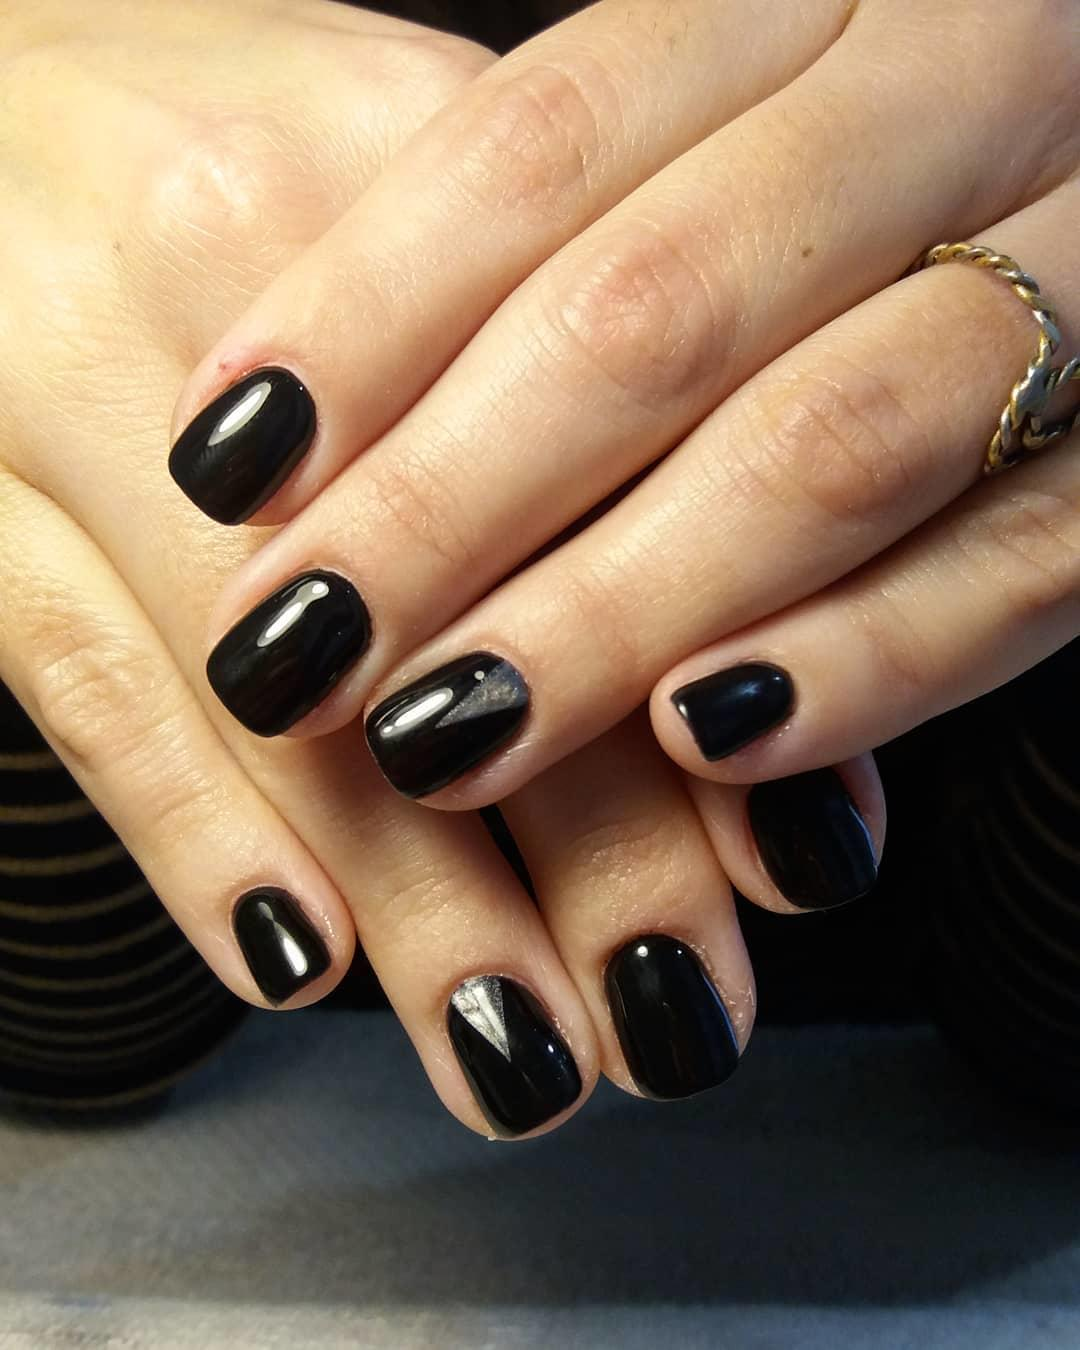 trendy black nail art designs and ideas 2019 3 - Trendy Black Nail Art Designs and Ideas 2019